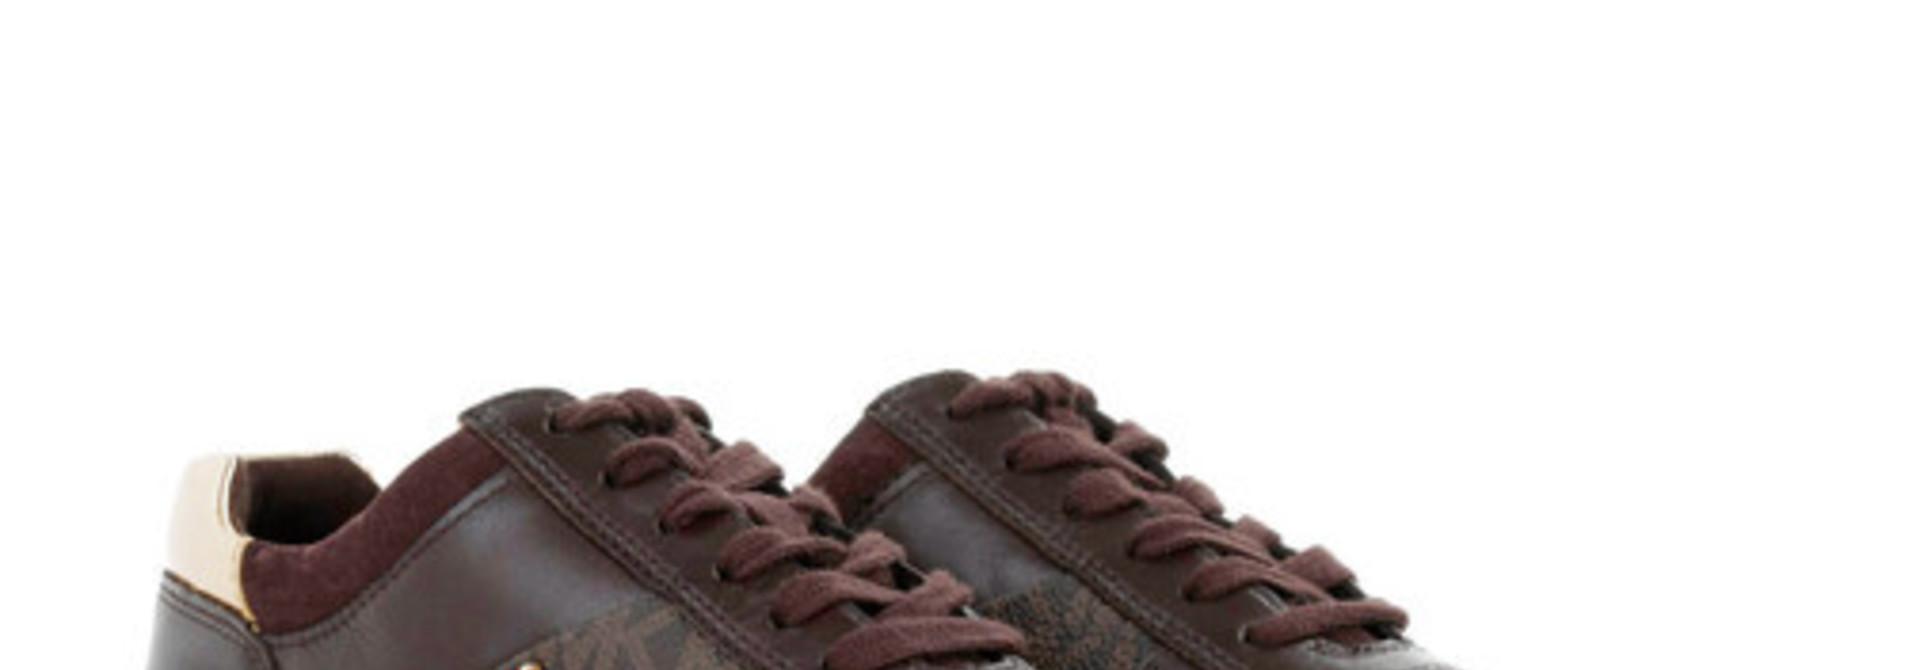 Michael Kors / Allie Wrap Trainer Brown